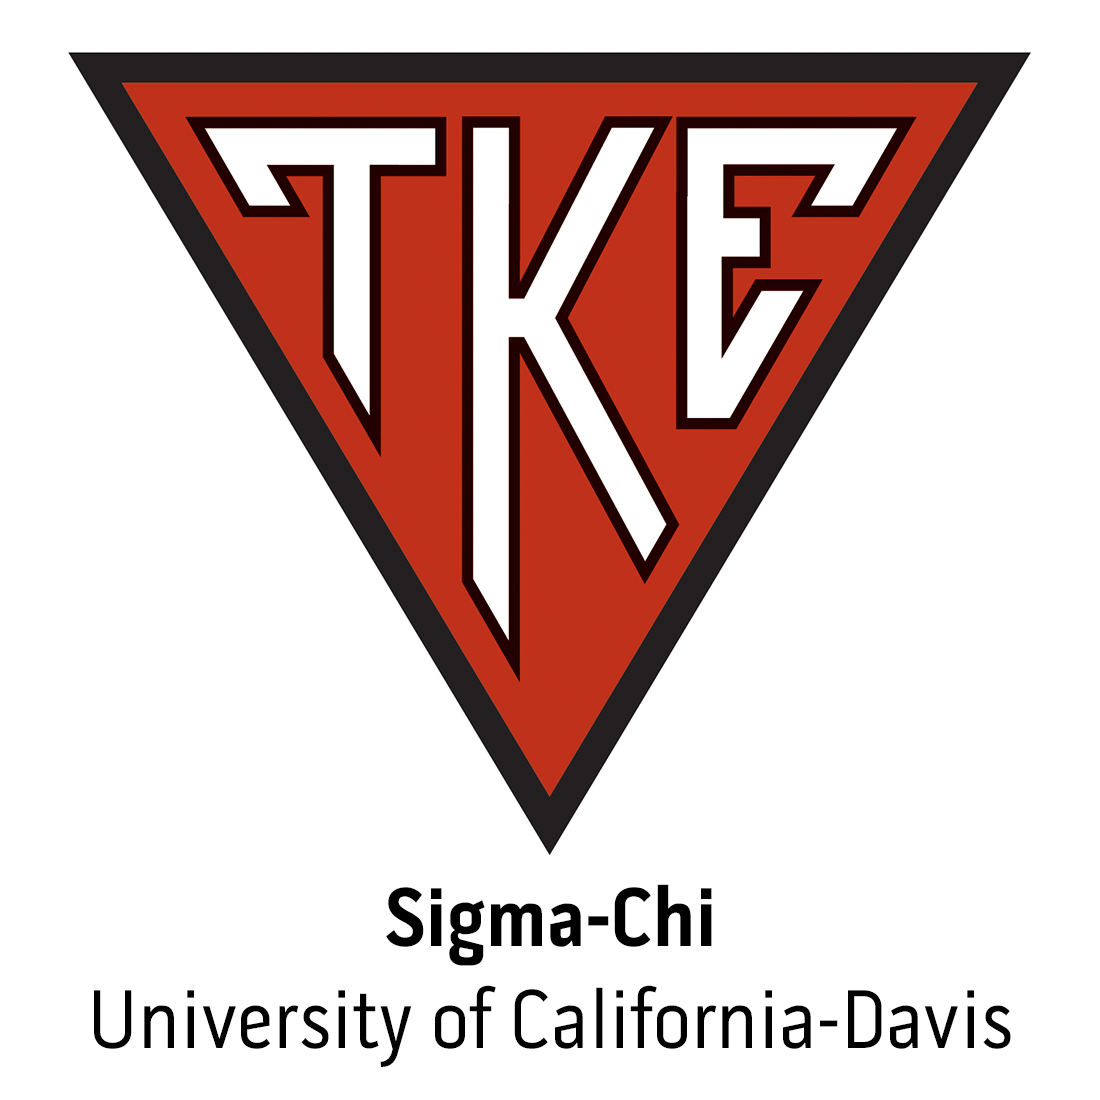 Sigma-Chi at University of California, Davis